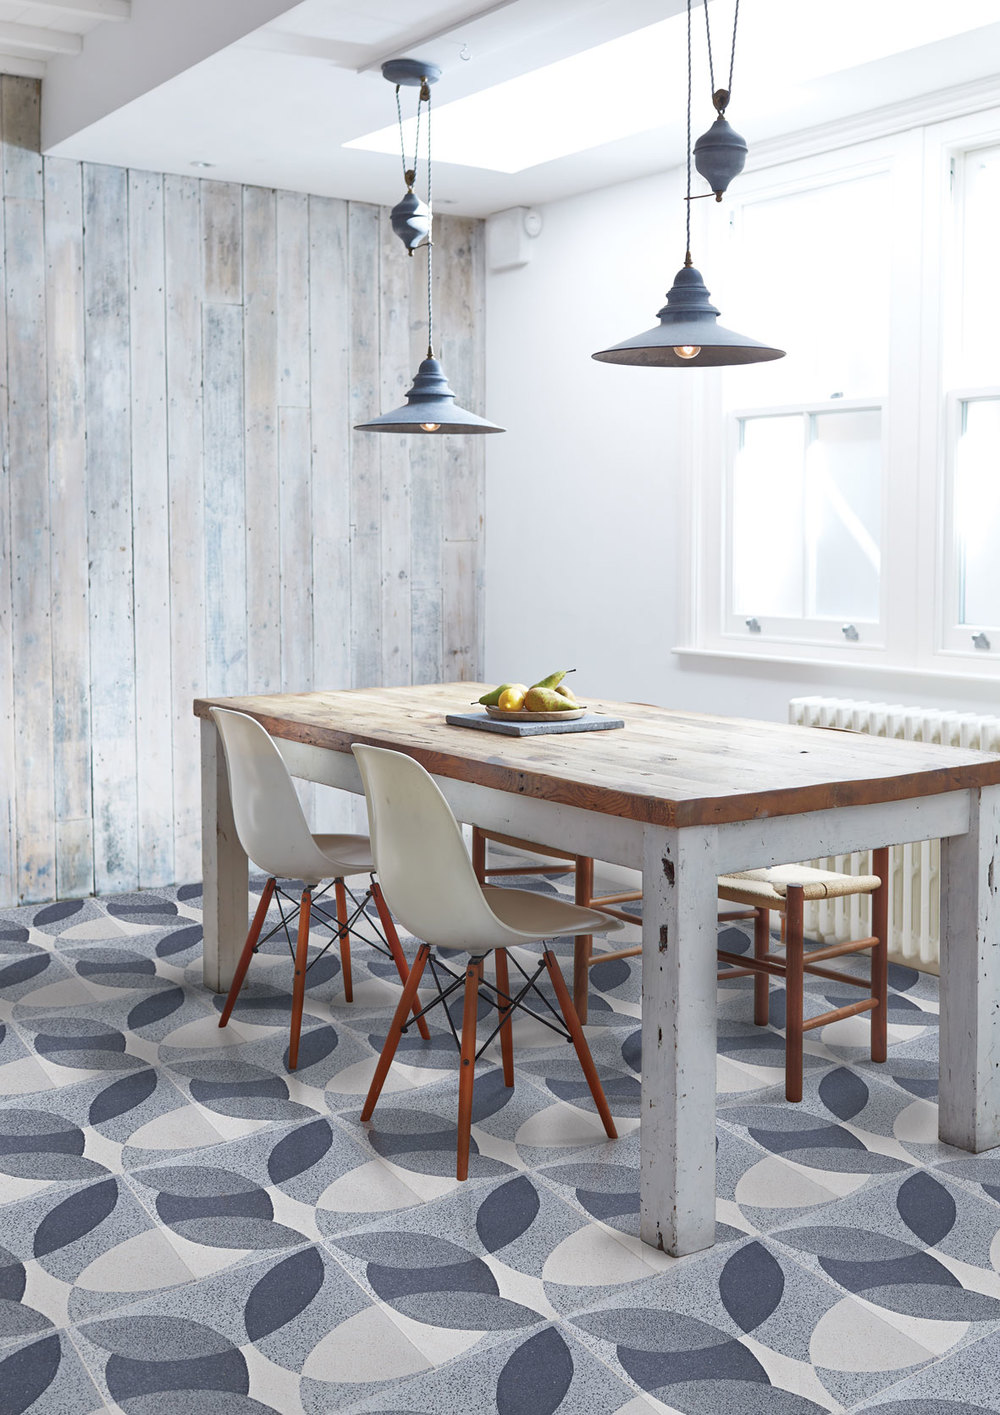 'Leaf' grey granito tiles